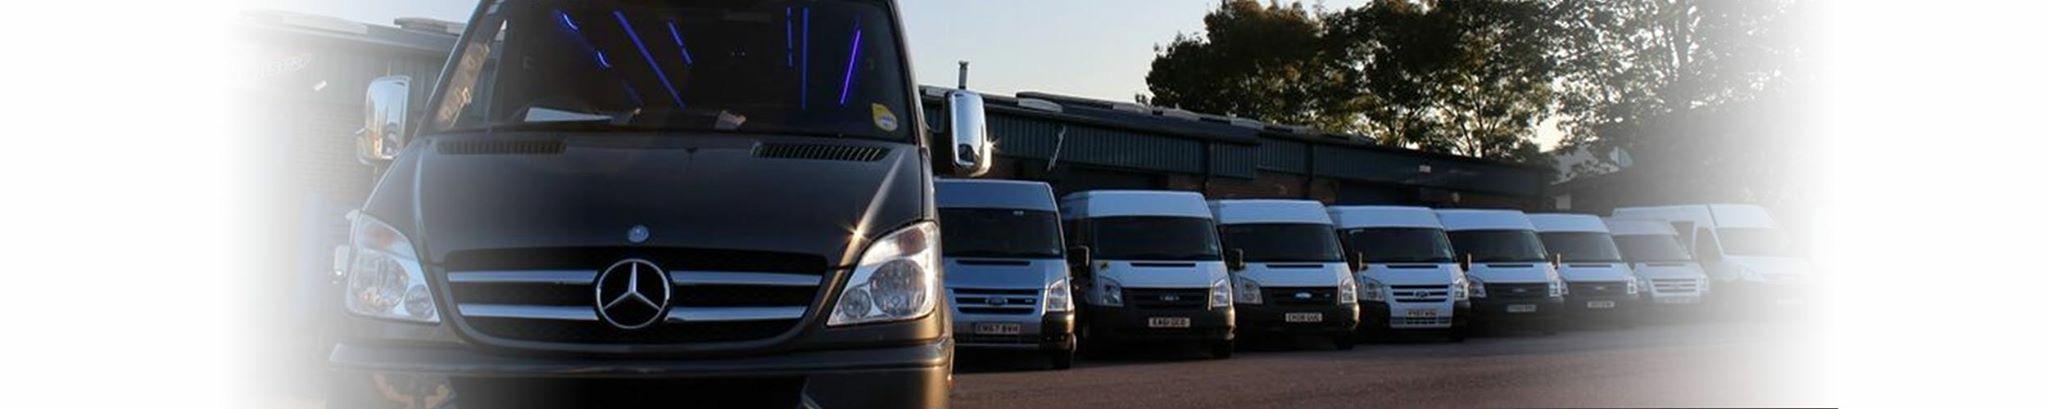 minibuses services